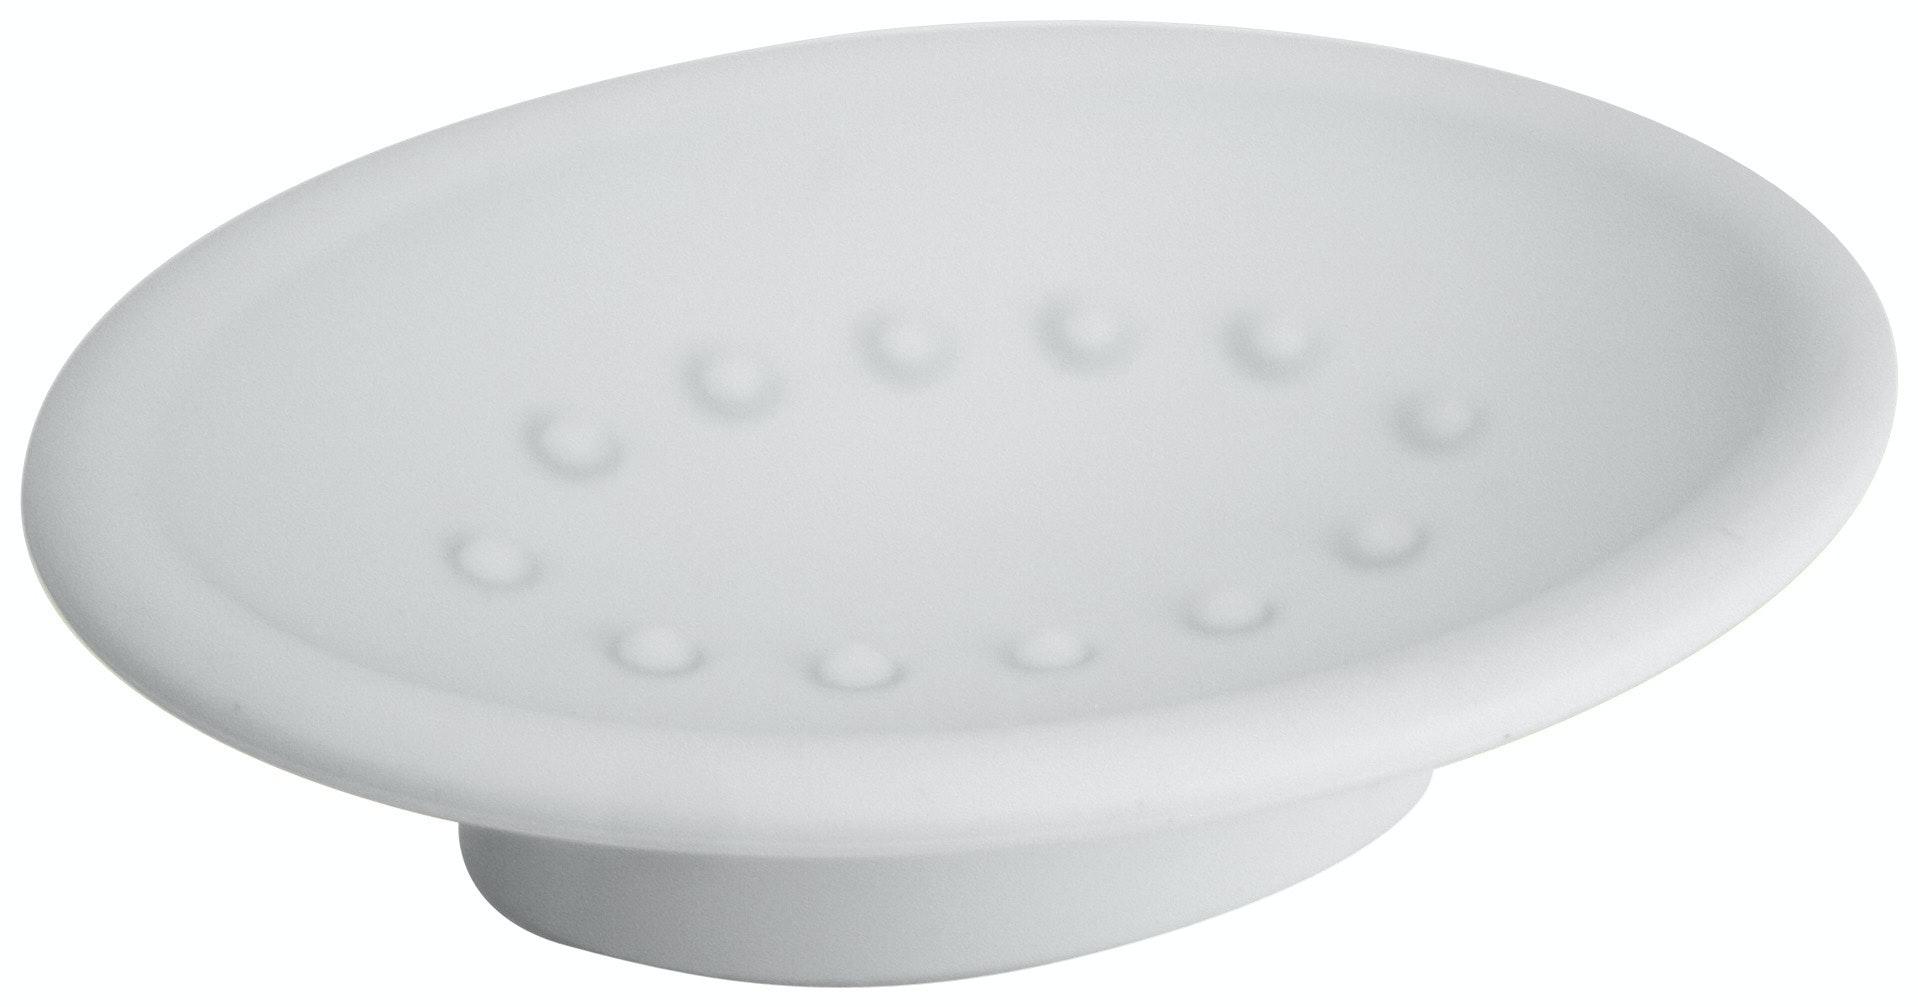 Tvålkopp Duschy Belizza 998-10 enkel vit